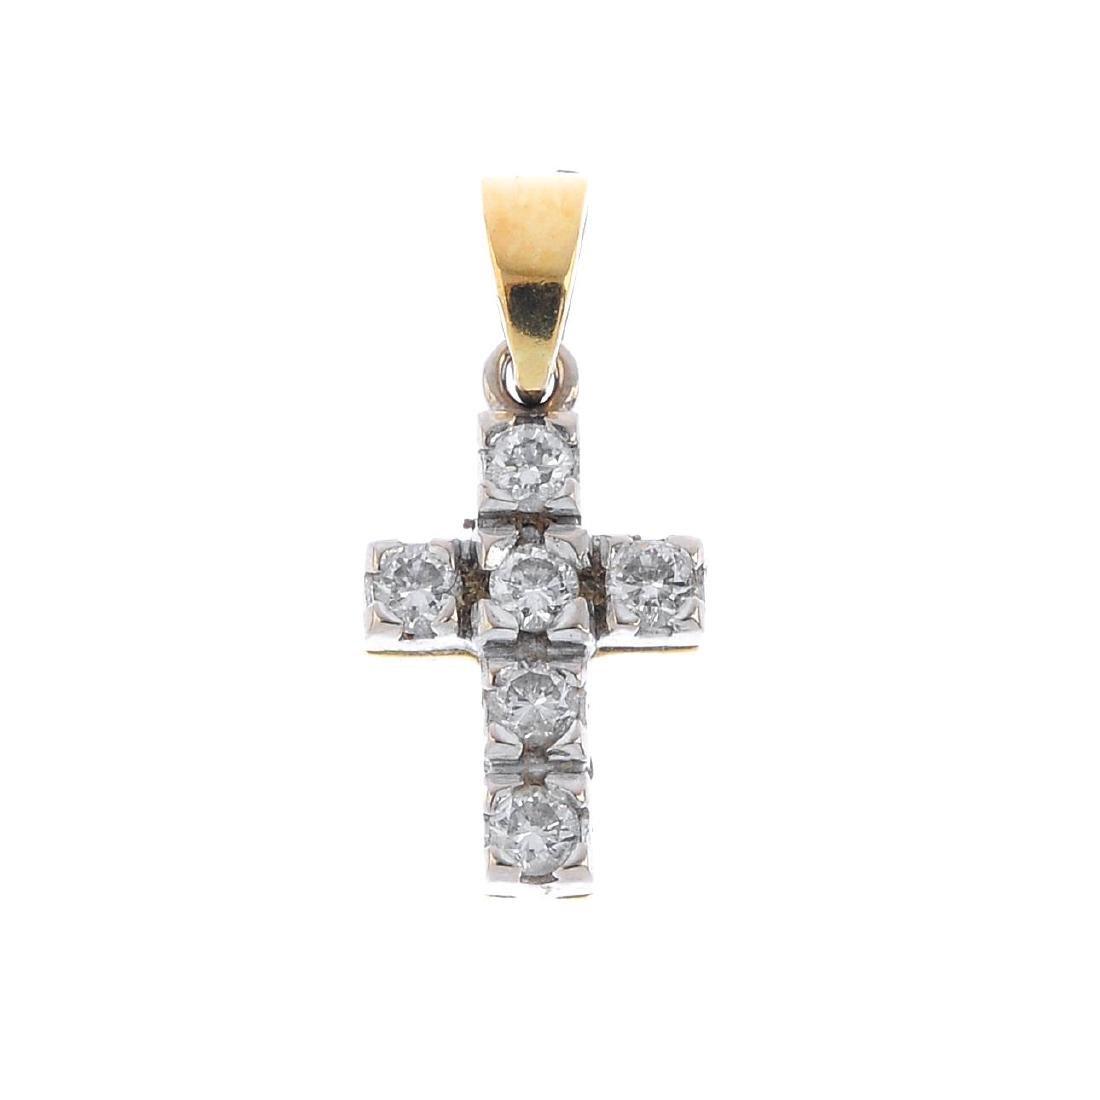 An 18ct gold diamond cross pendant. The brilliant-cut